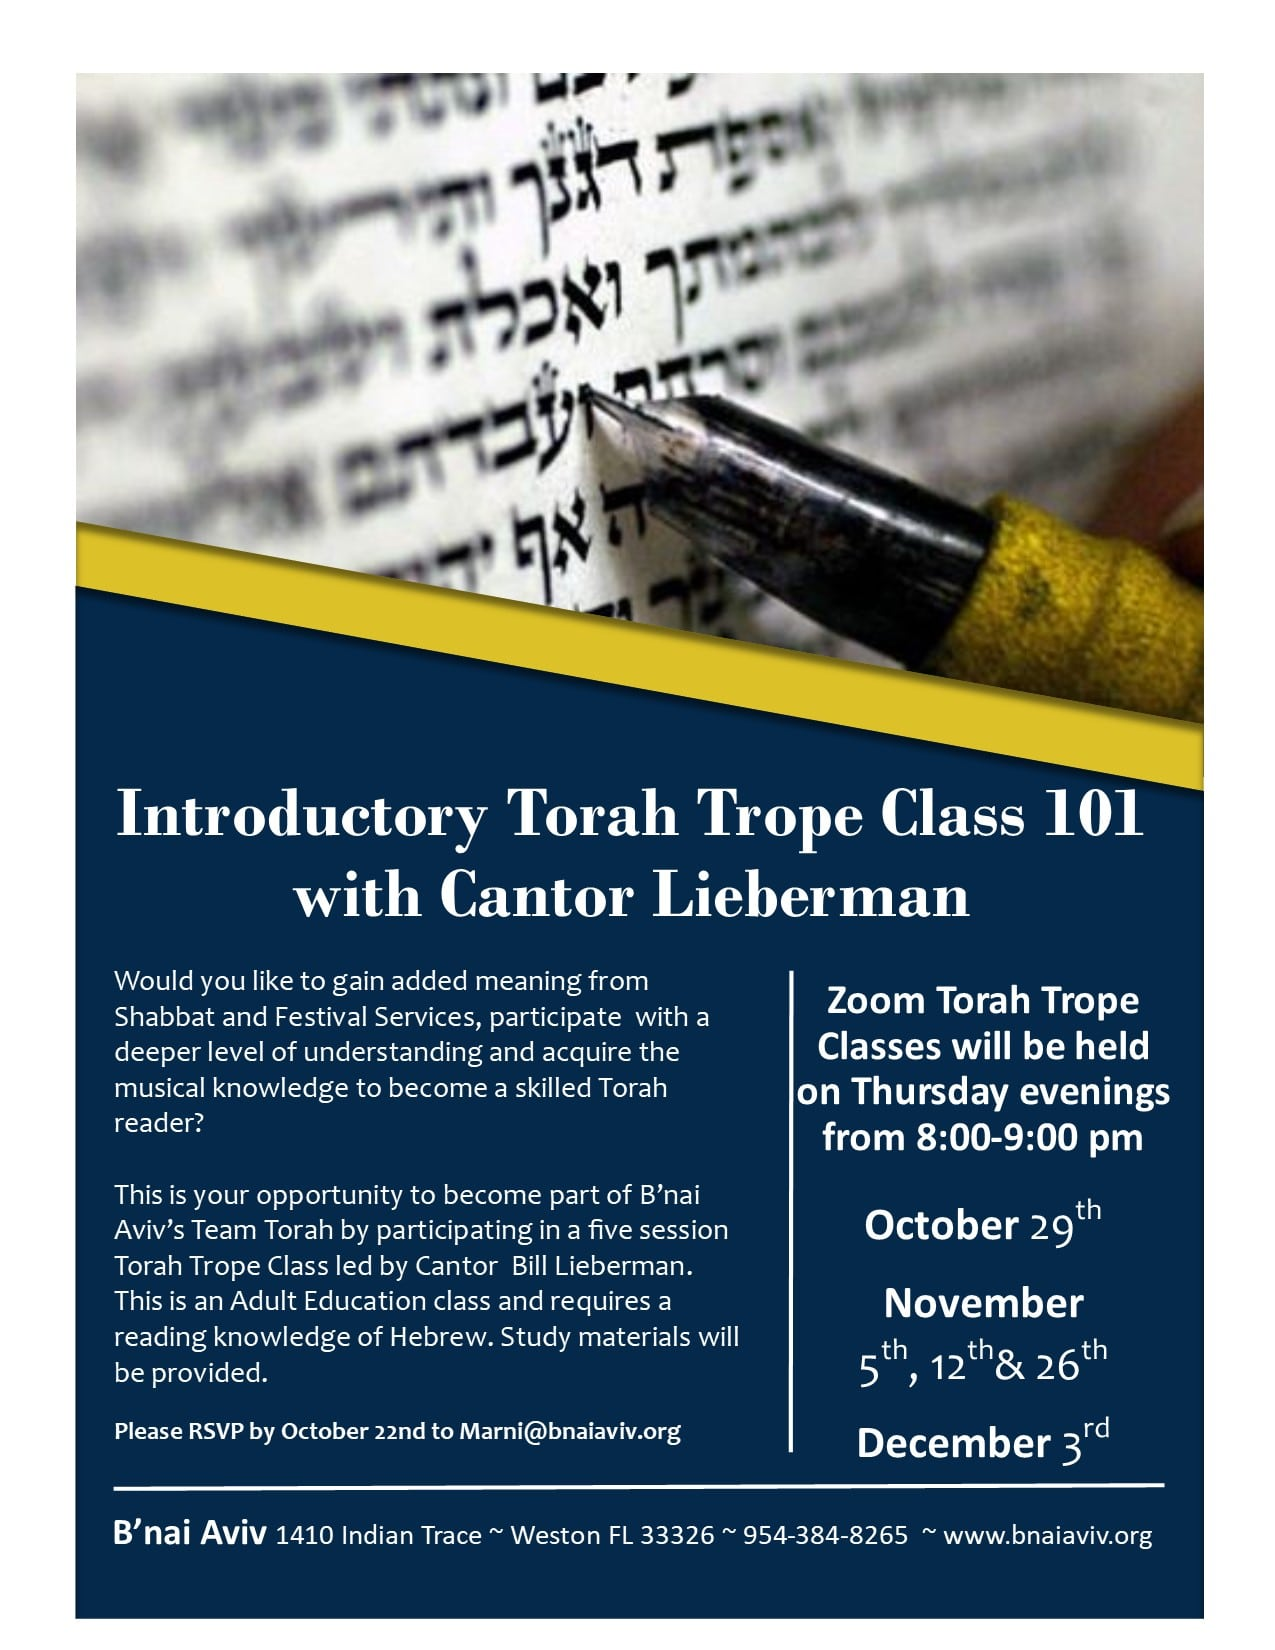 Torah Trope Shabbat And Festival 2020